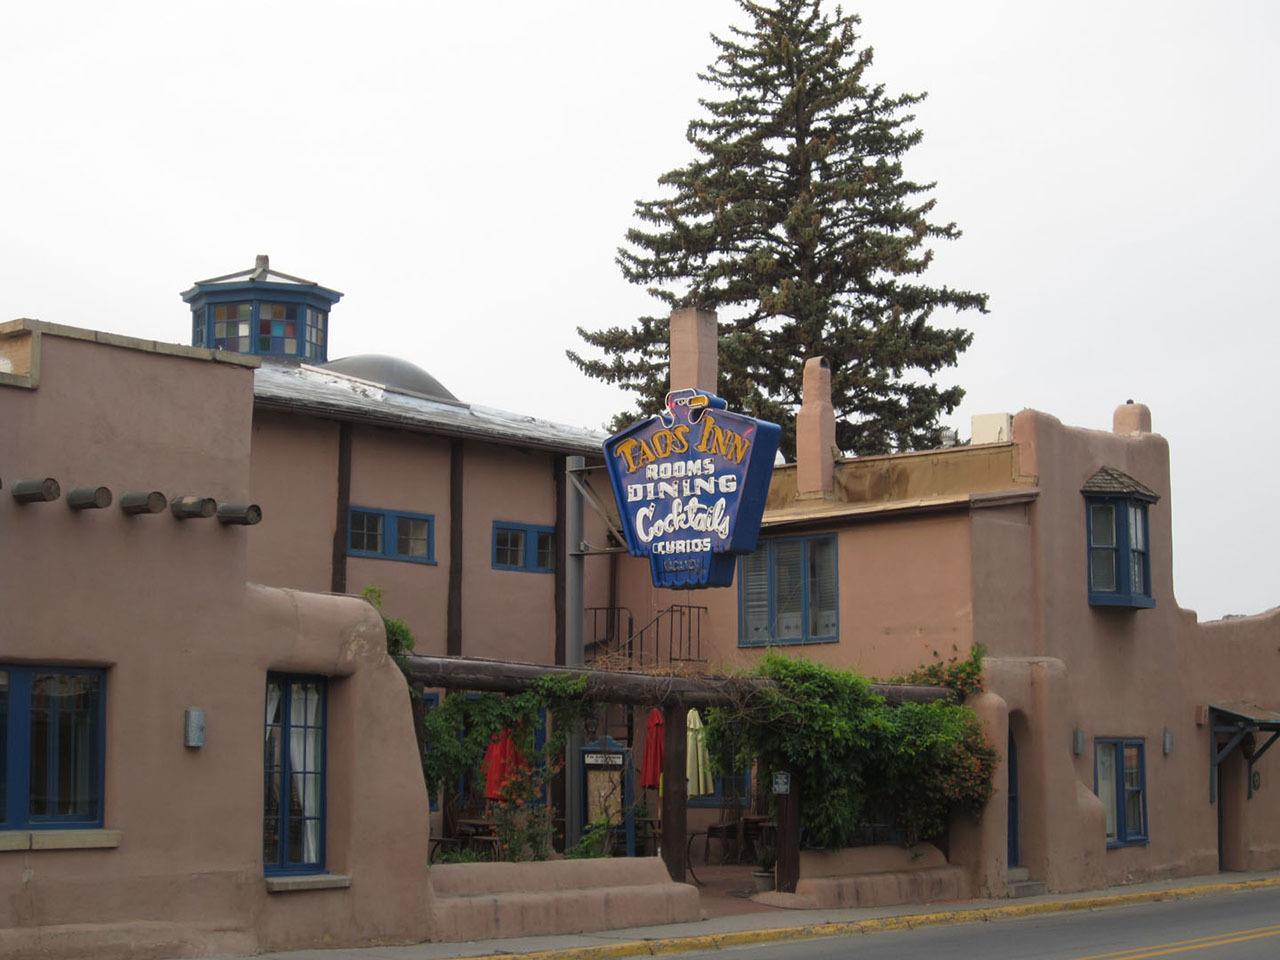 #Taos neighborhoods #Taos Inn #Town of Taos #Taos #New Mexico